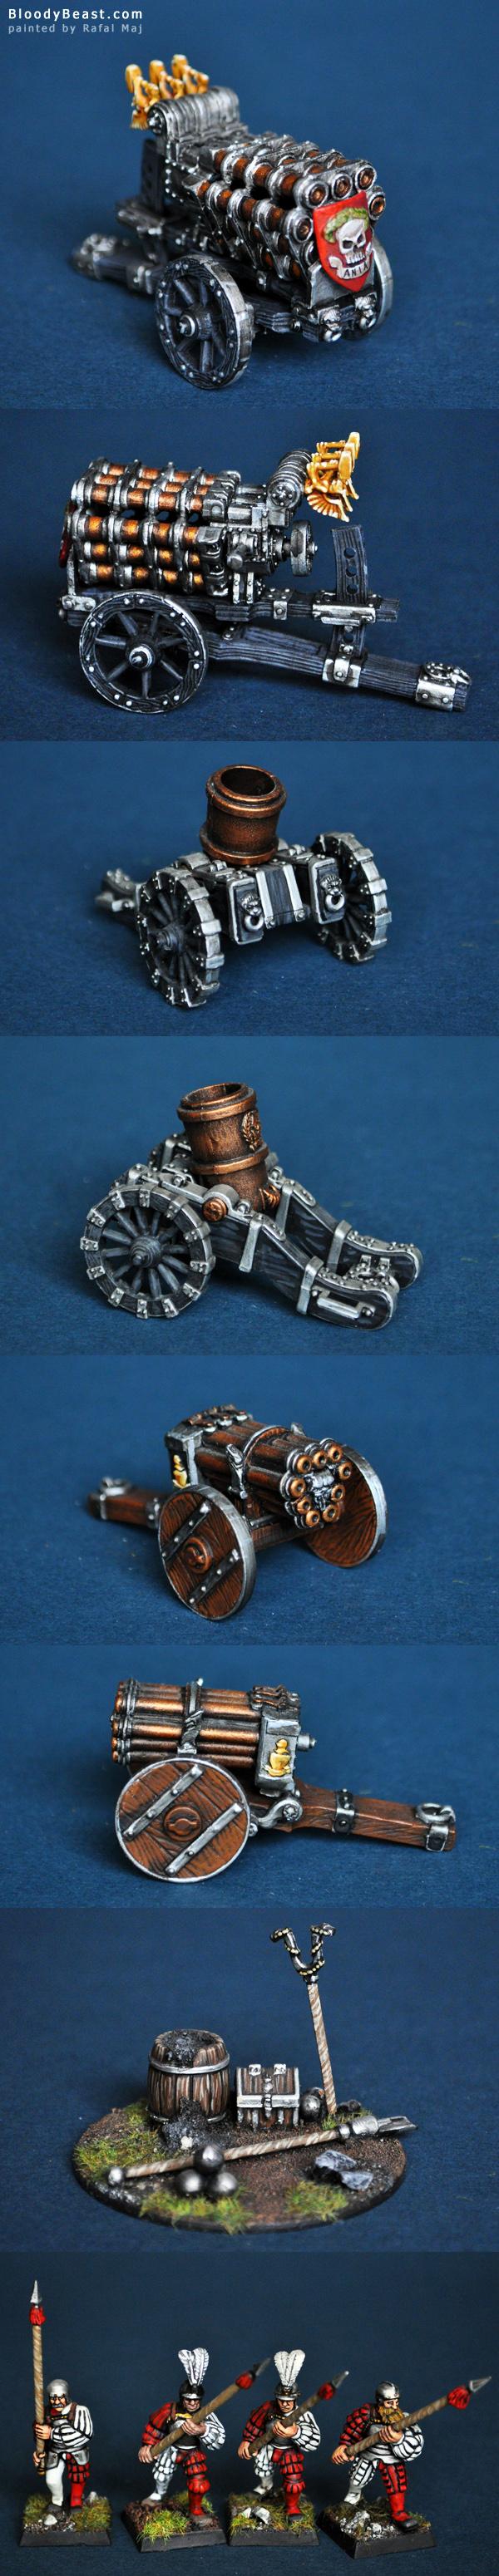 Empire Artillery painted by Rafal Maj (BloodyBeast.com)